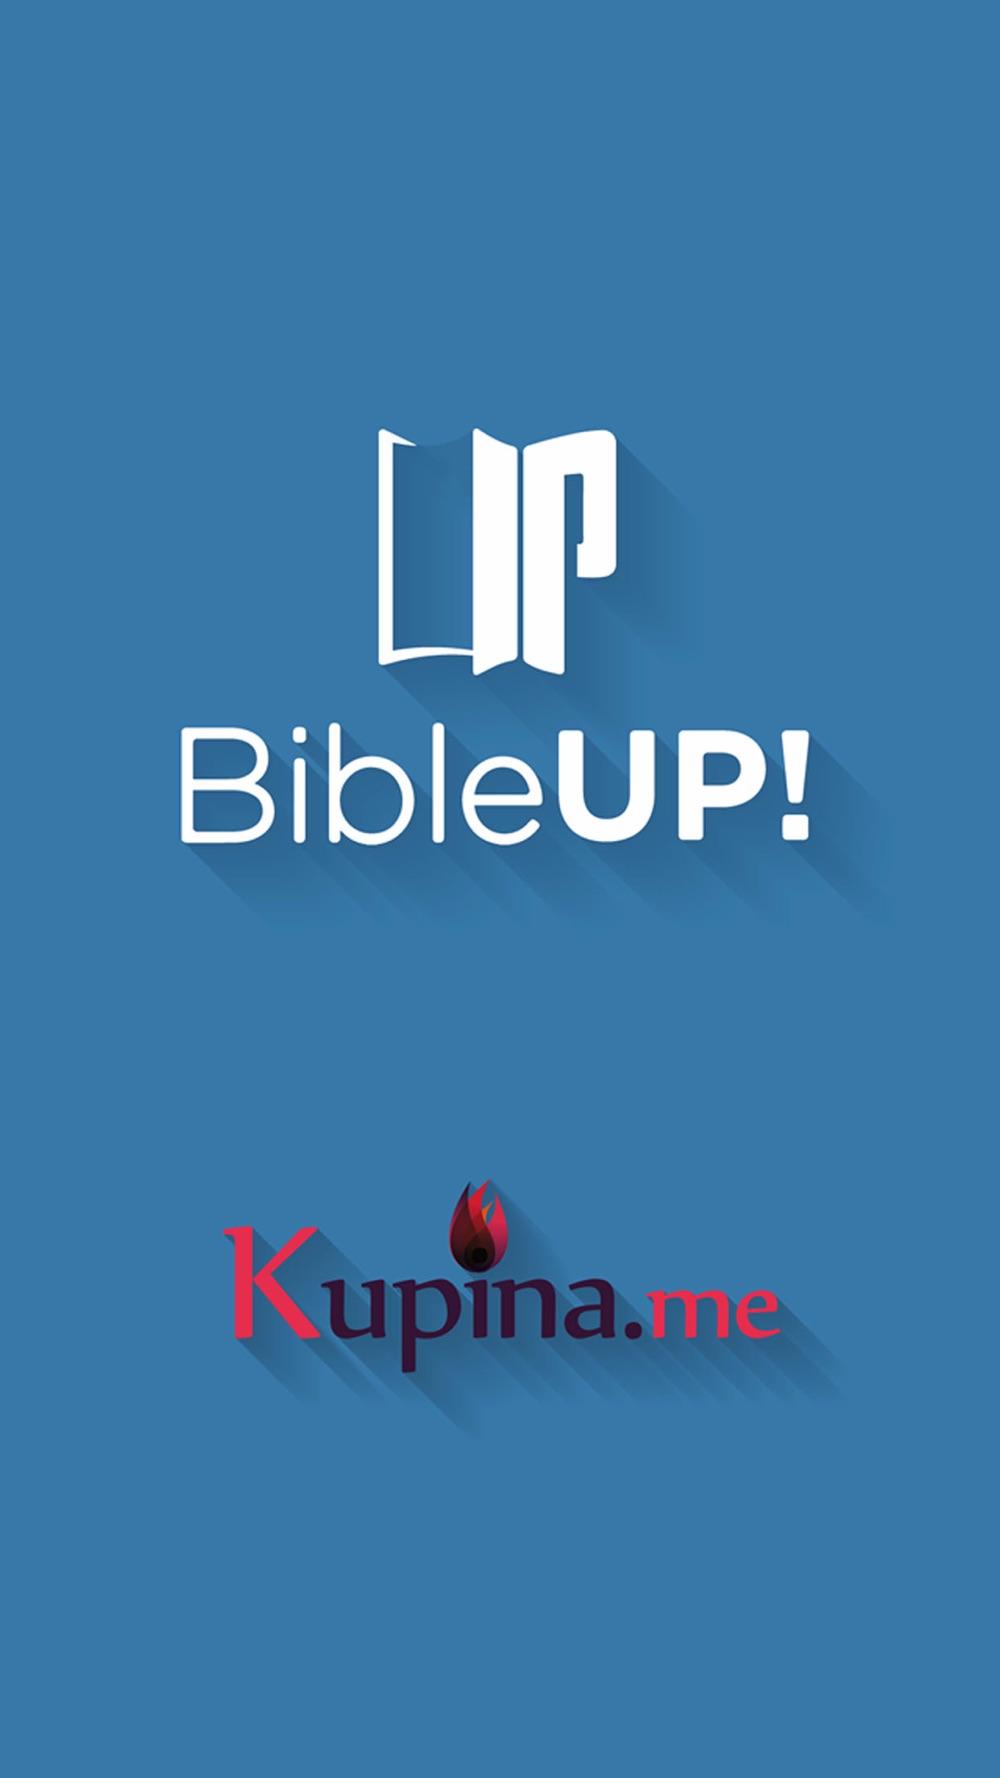 BibleUP! Bible Riddles Cheat Codes